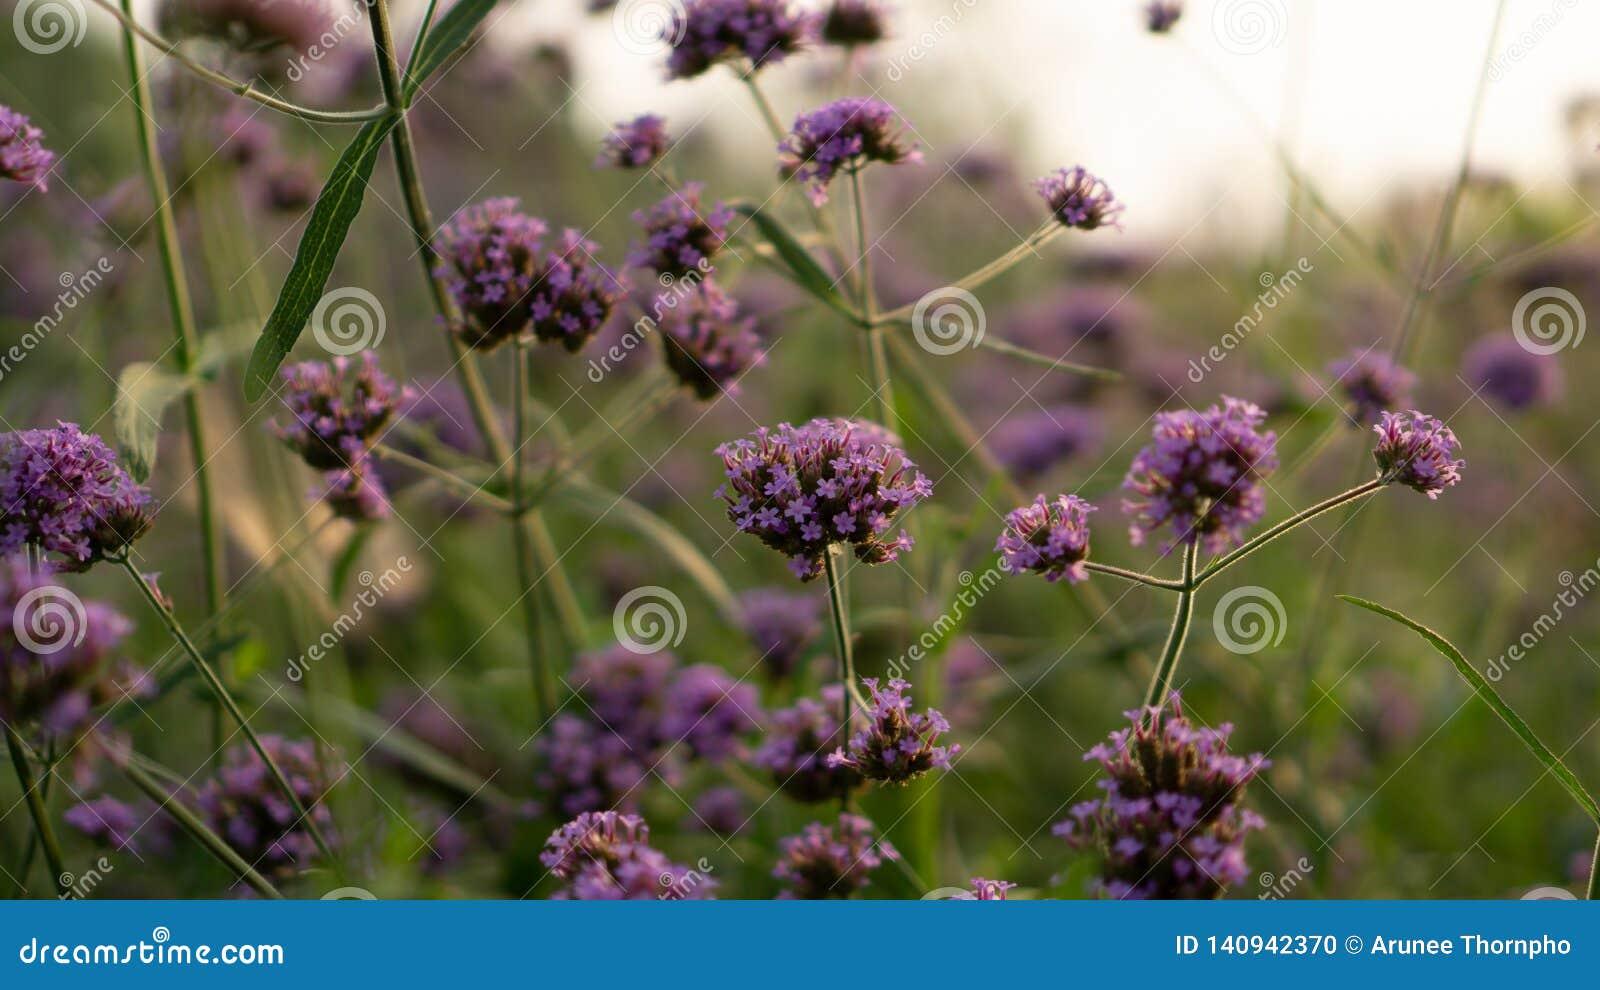 Field of purple petite petals of Vervian flower blossom on green leaves under sky, know as Purpletop vervian or vebena